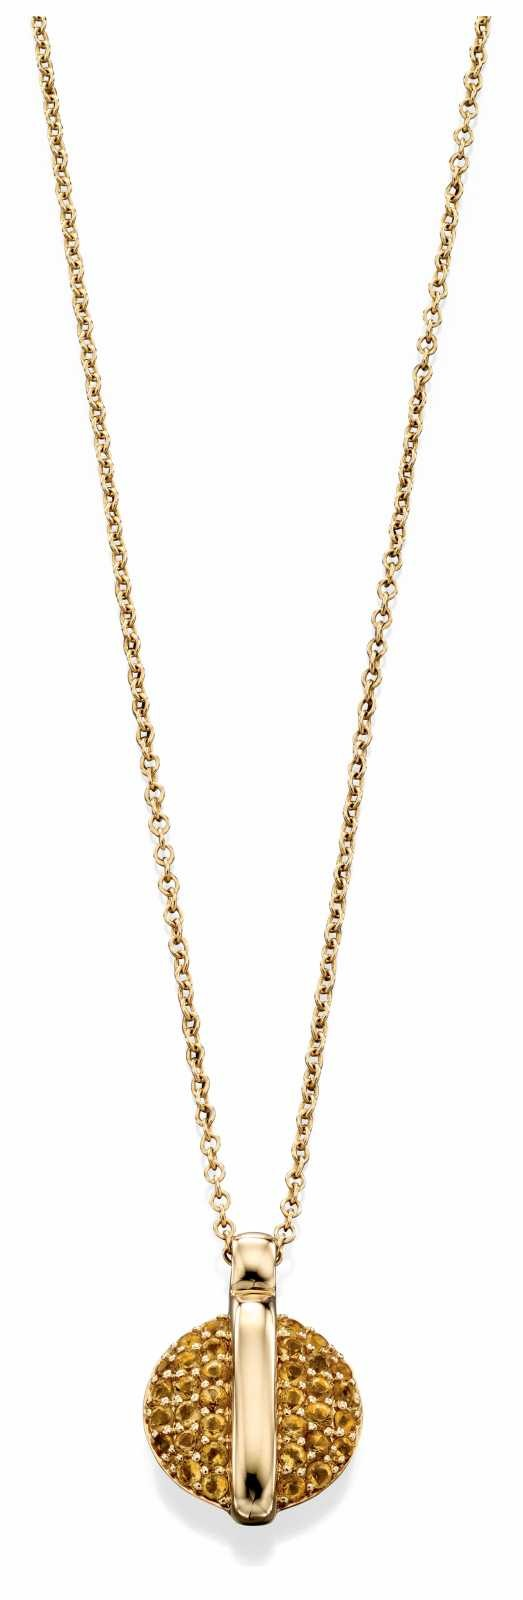 Fiorelli Gold 9k Yellow Gold Pavé Citrine Disc Necklace GN251